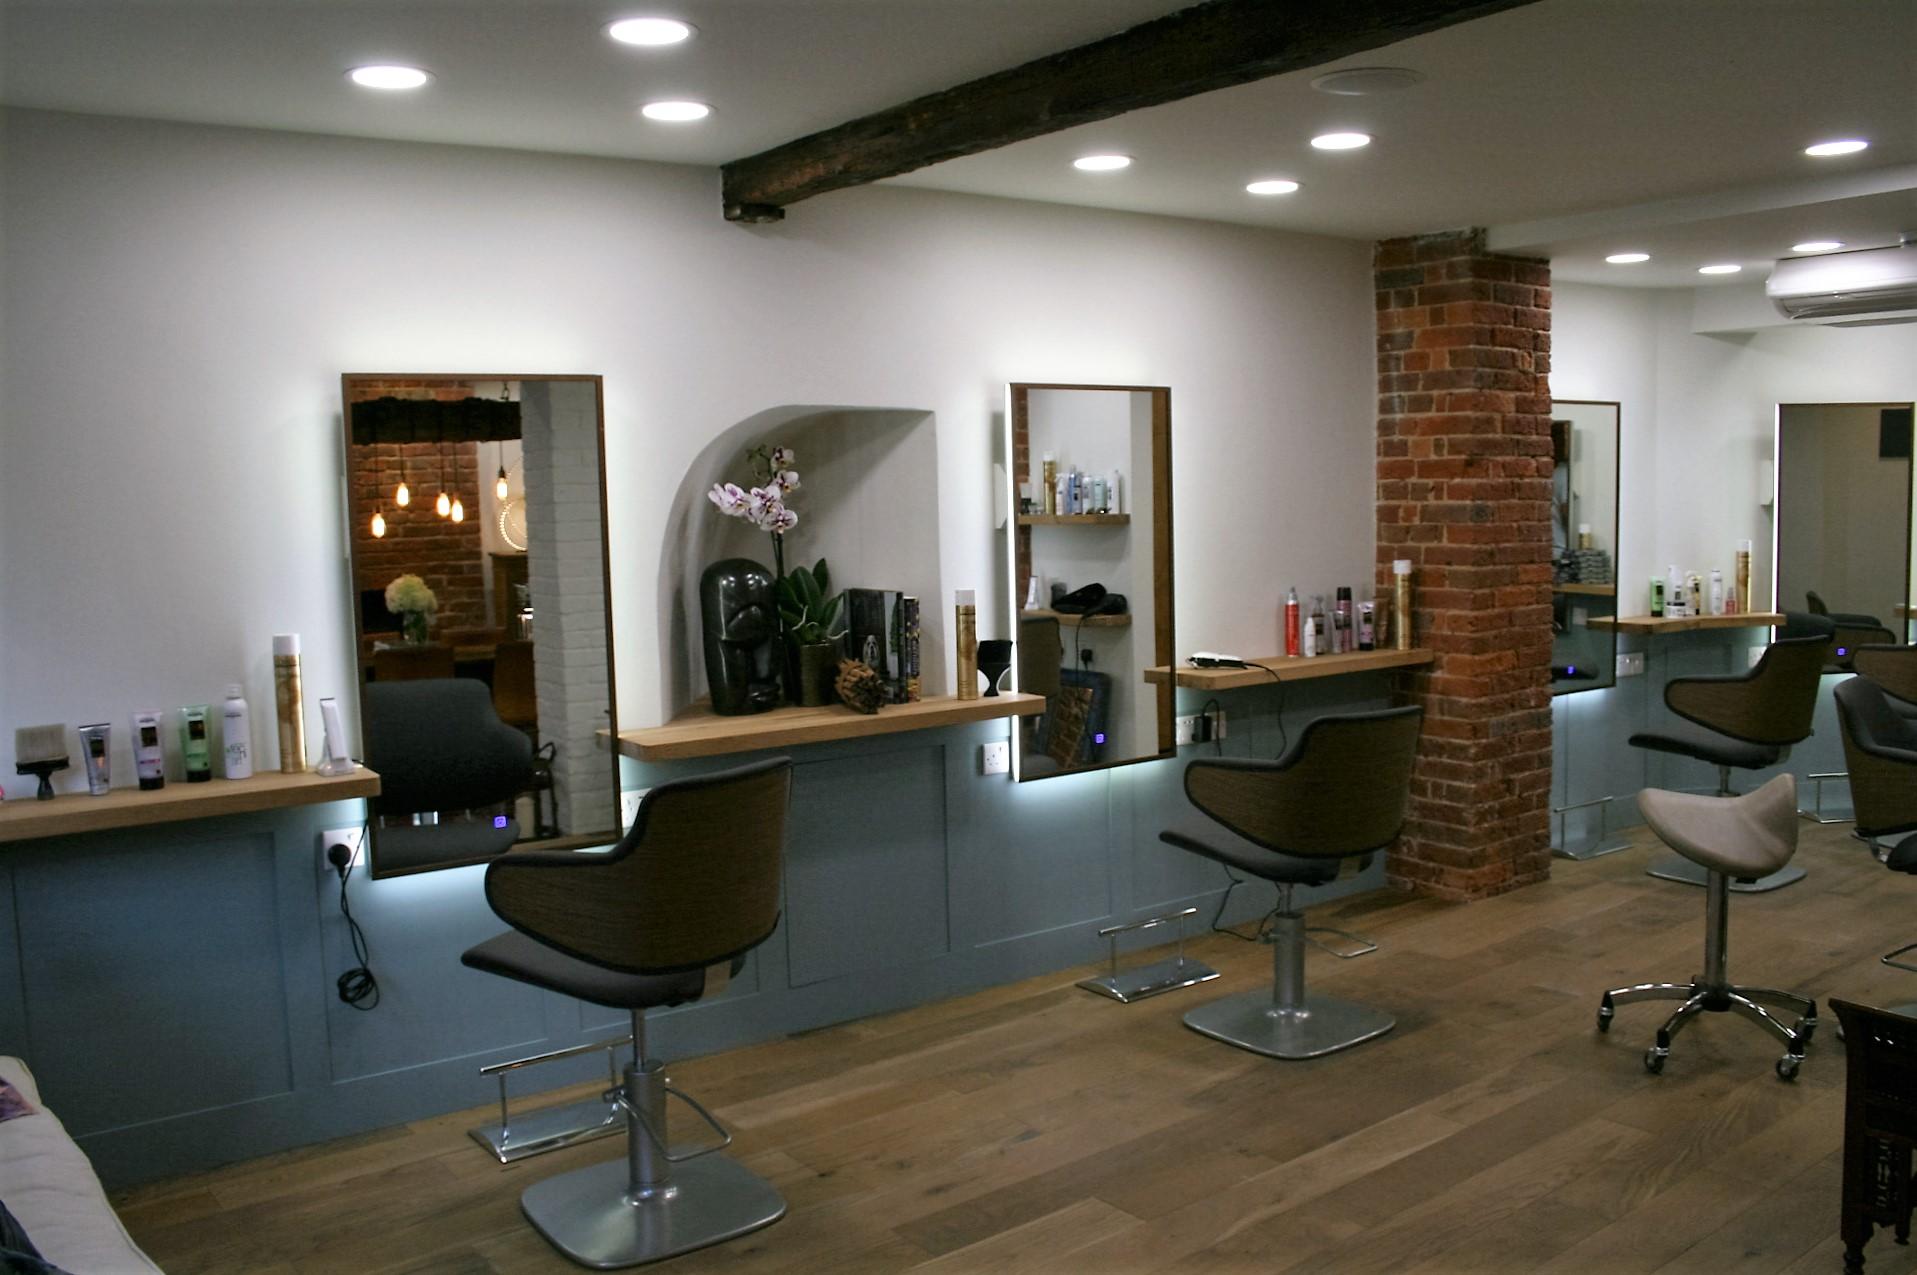 Christopher heeney tristan eves hair salon - Christophe hair salon ...